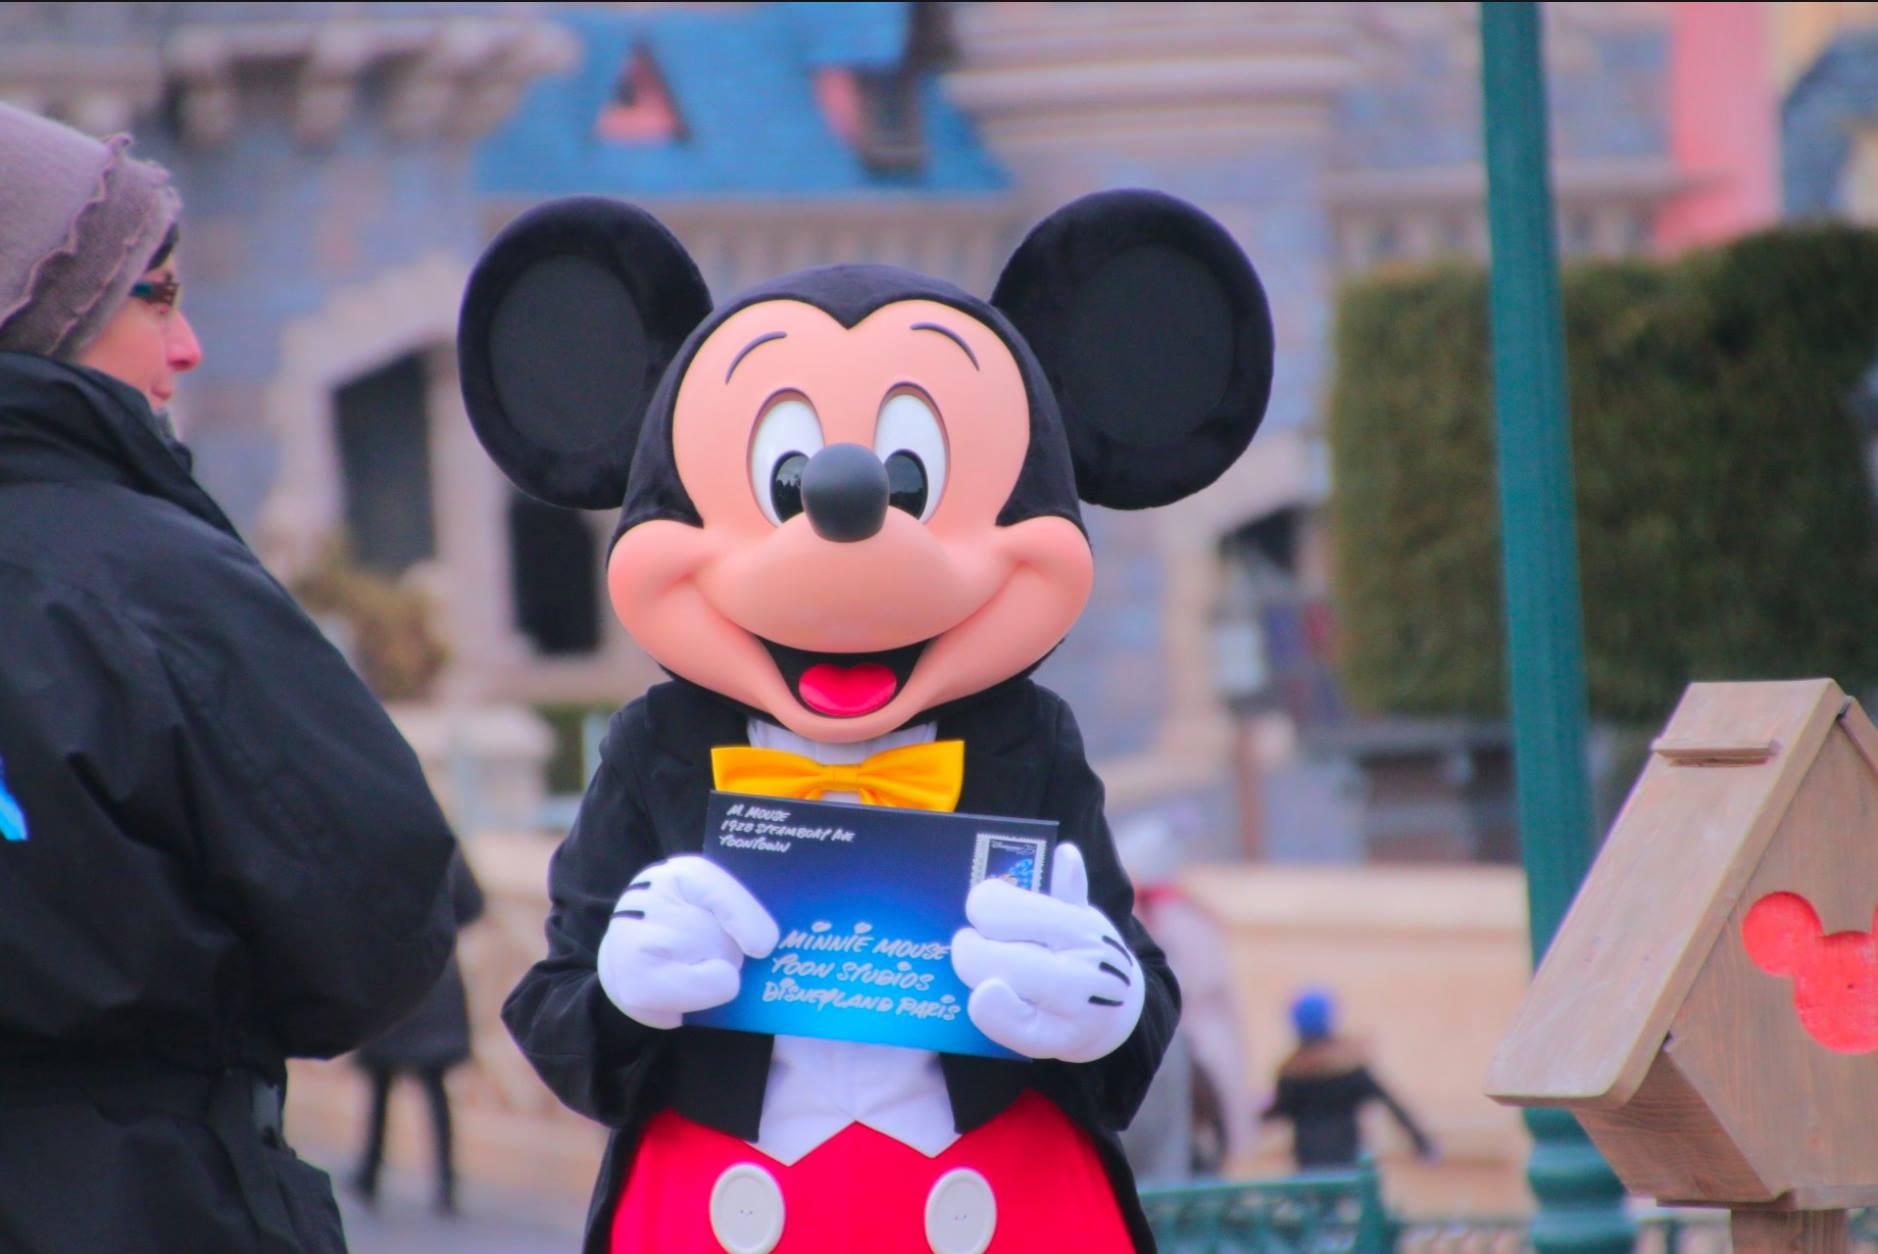 25° anniversario di Disneyland Paris - Pagina 6 0001a20